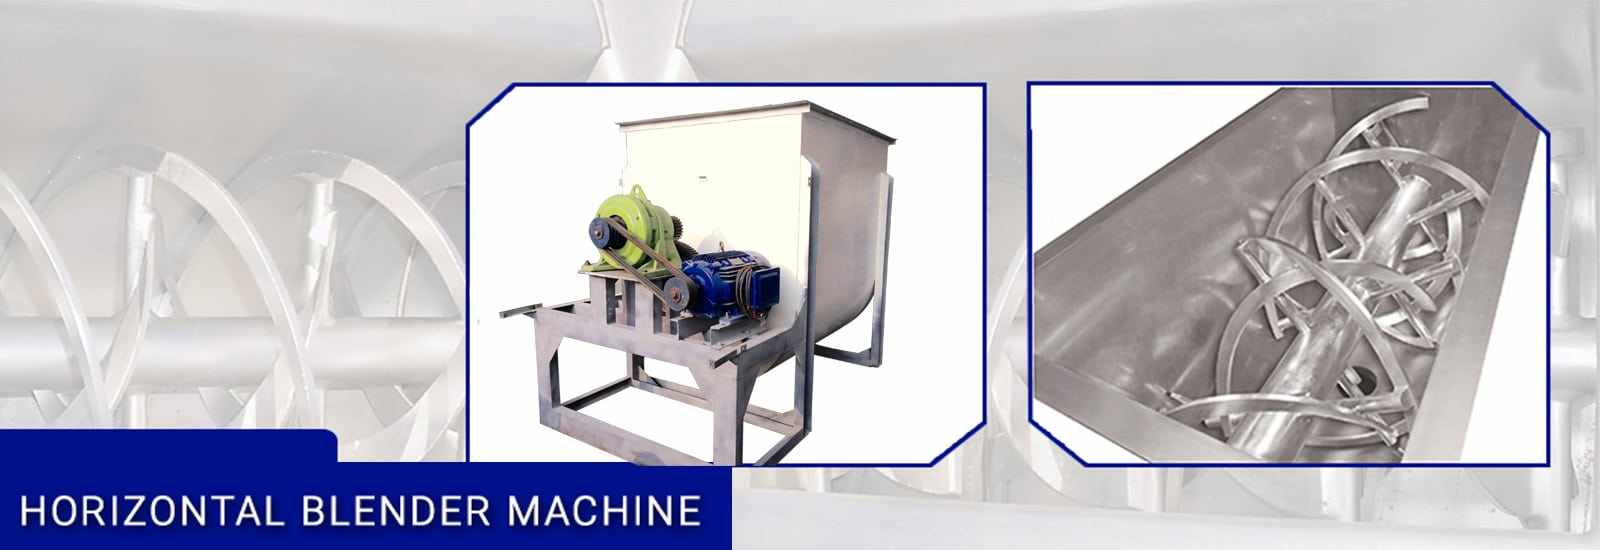 horizontal blender machine manufacturer in maharashtra